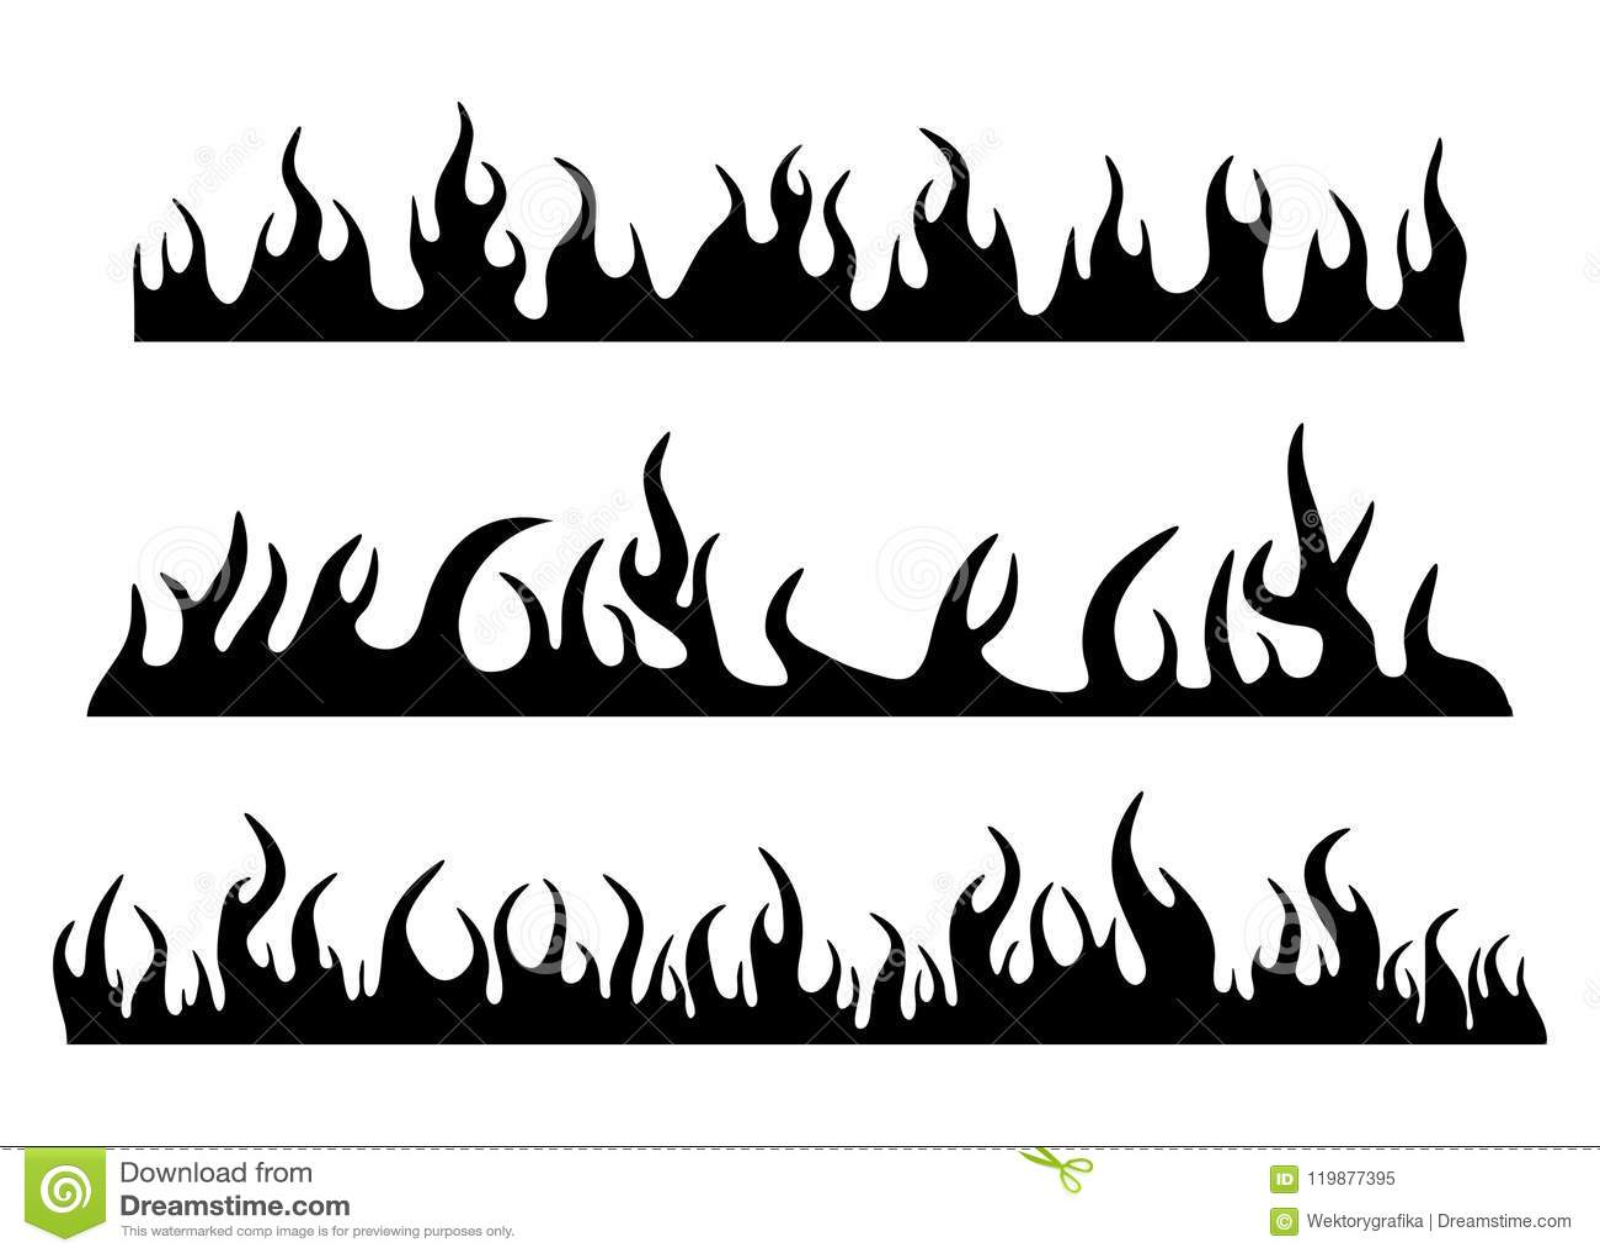 Burning Fire Flame Silhouette Set Banner Horizontal Design